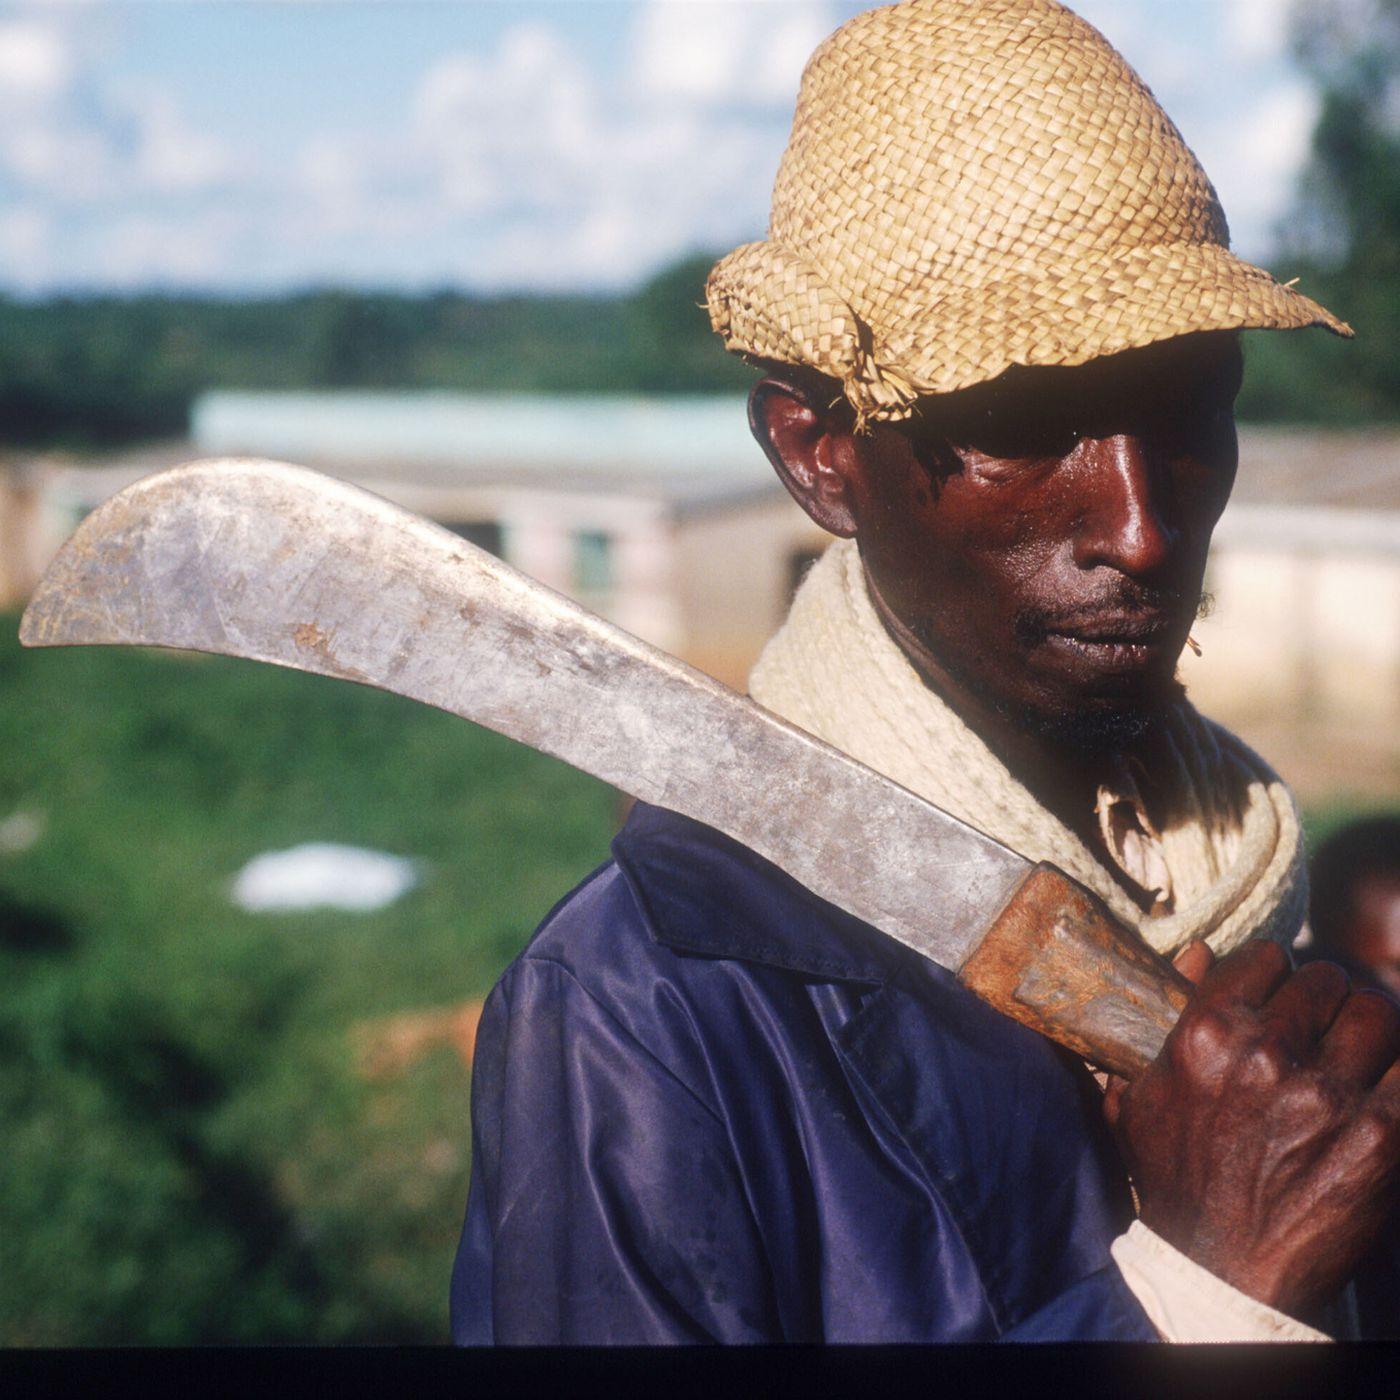 Rwandan genocidemac